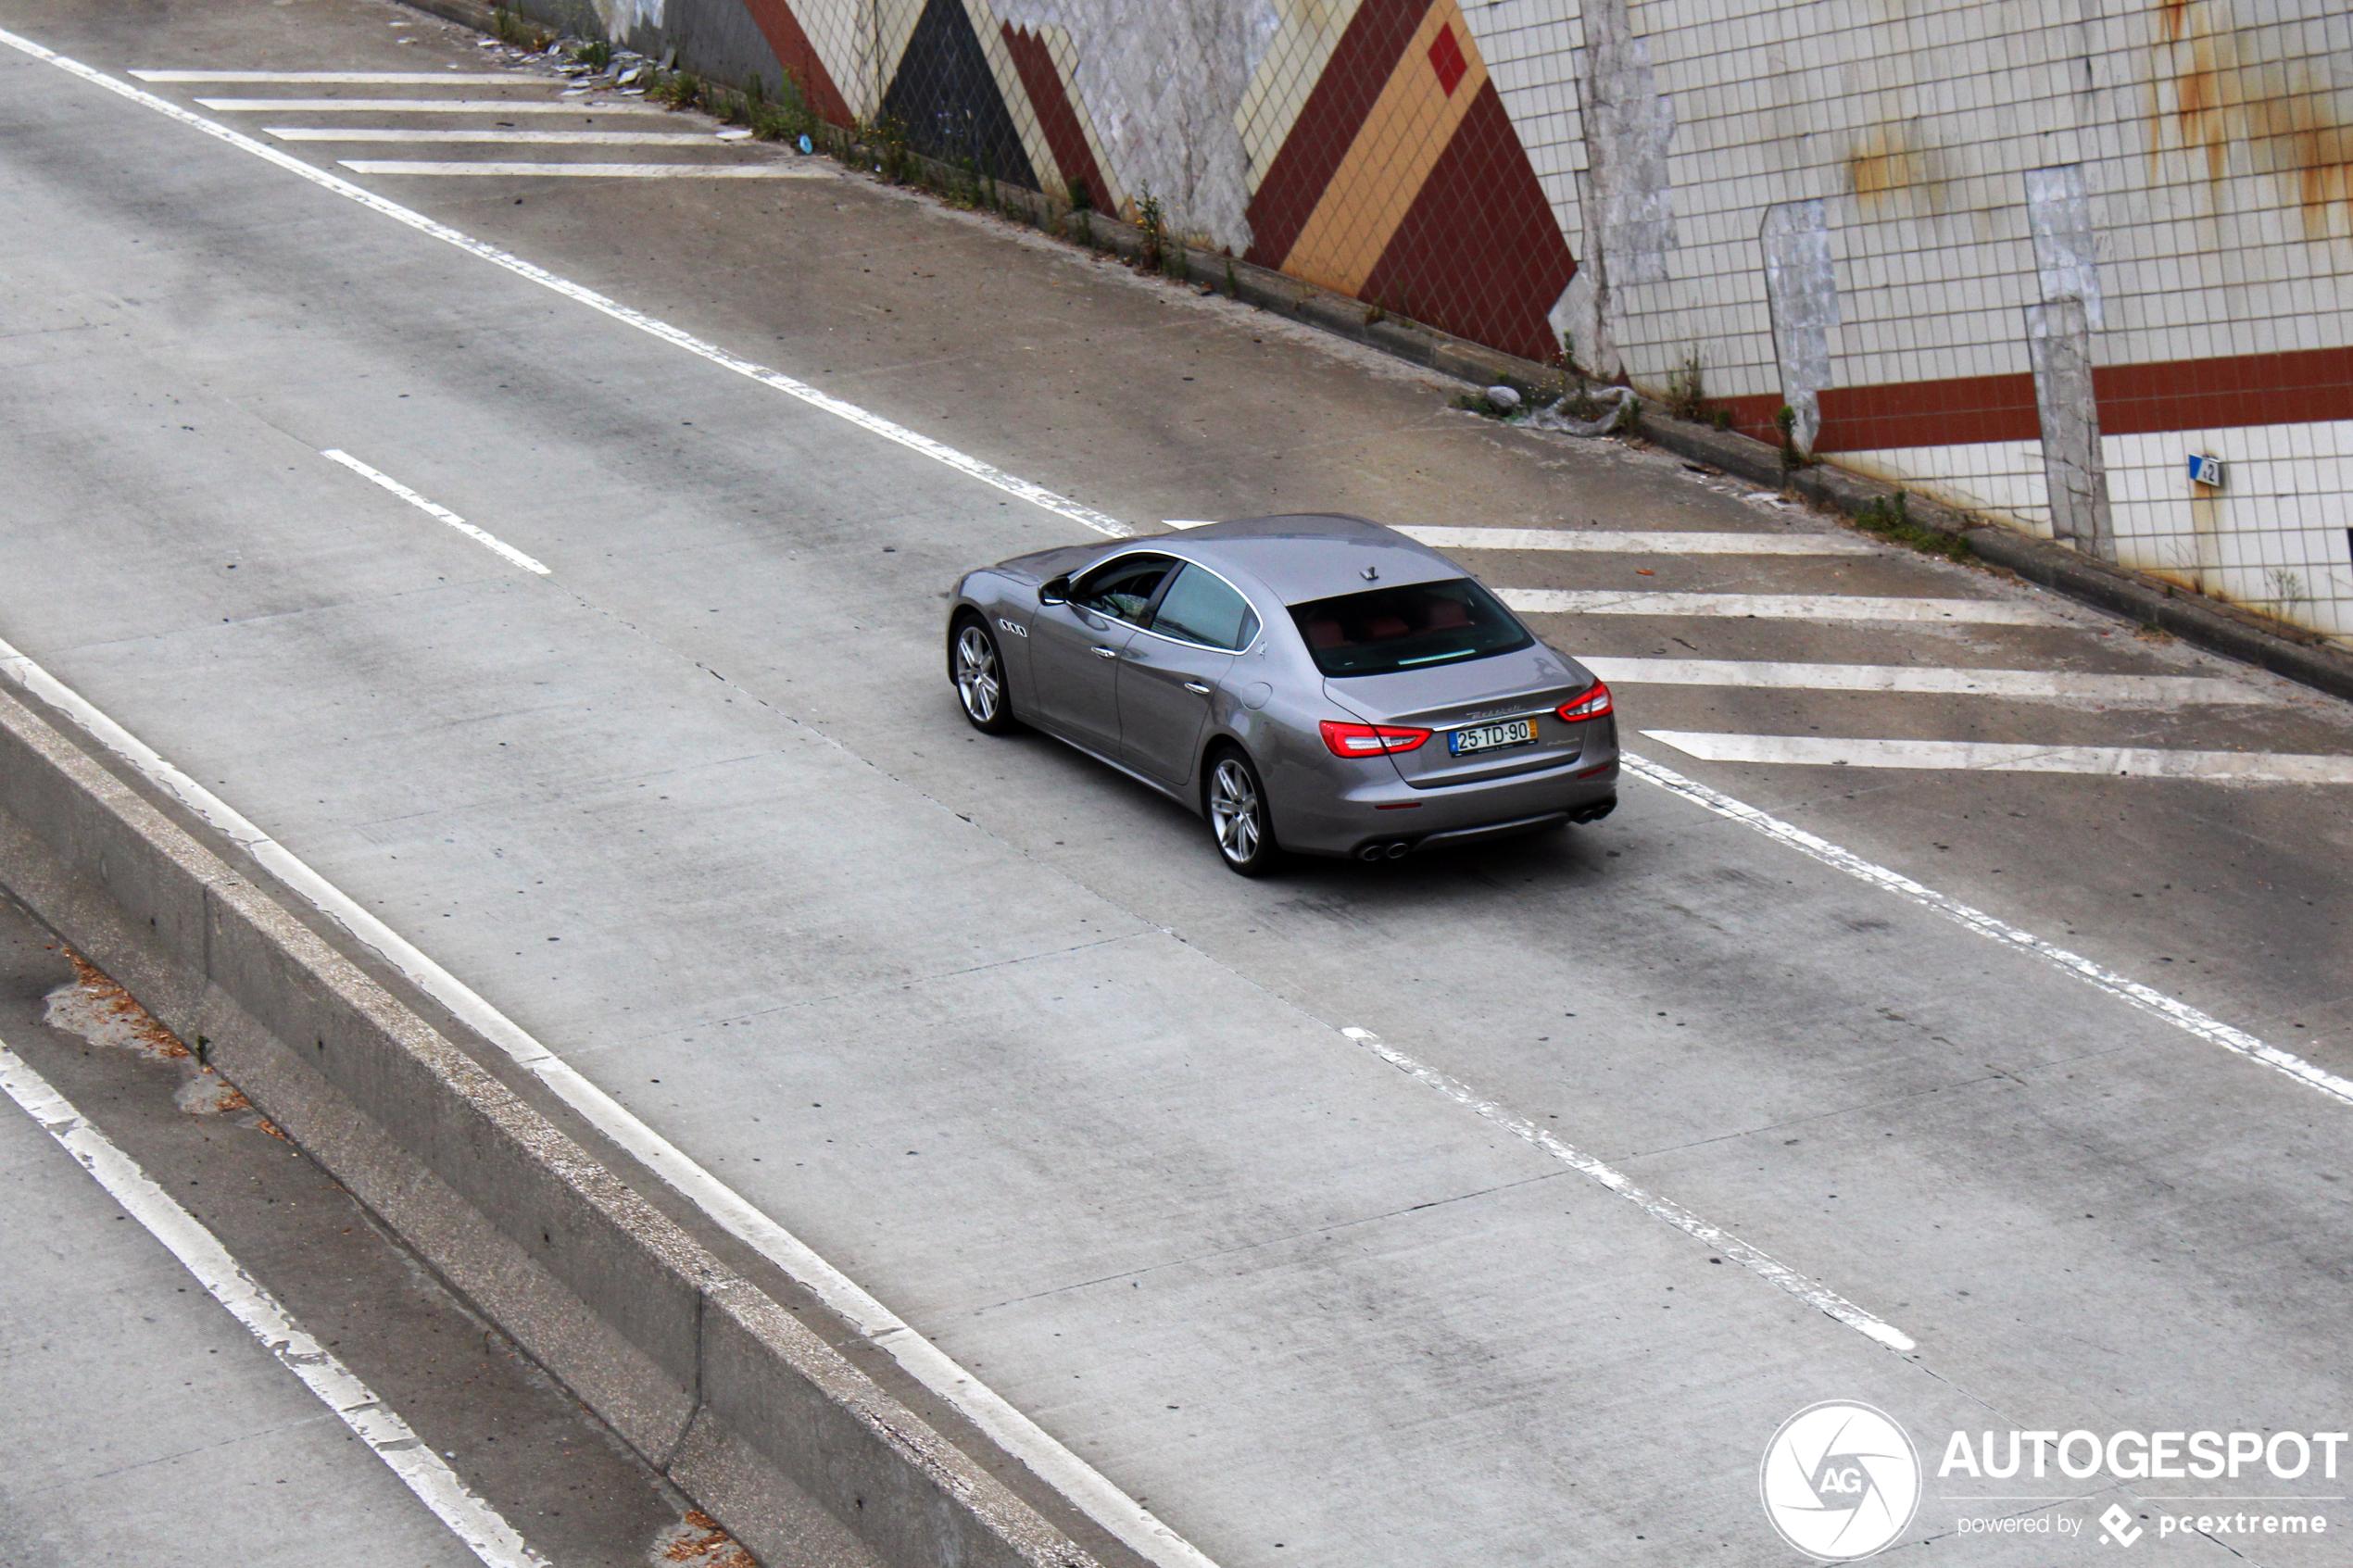 Maserati Quattroporte Diesel GranLusso - 19 June 2020 - Autogespot